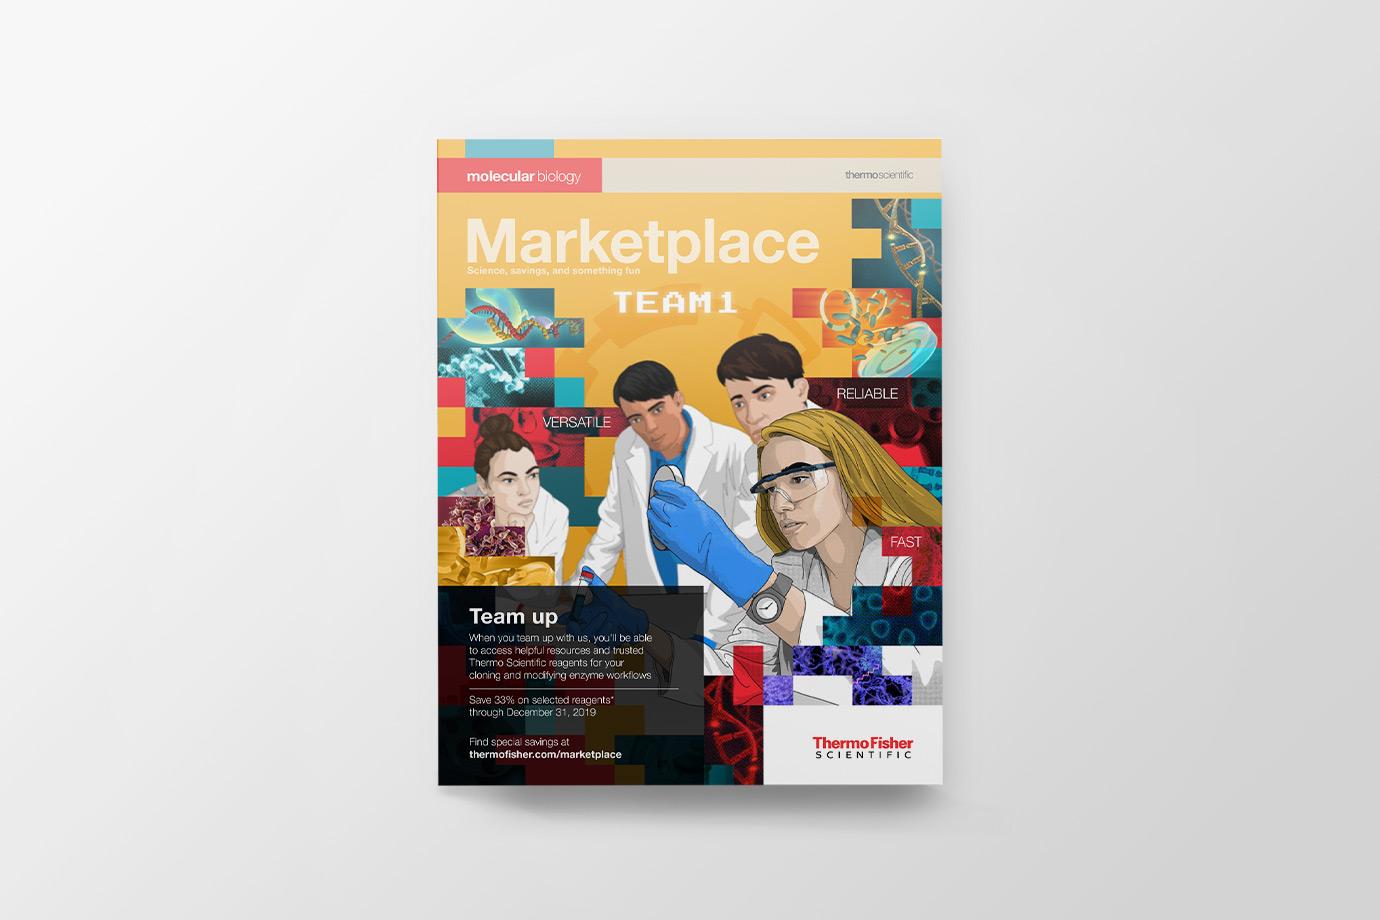 BON_TFS_marketplace_3_cover.jpg